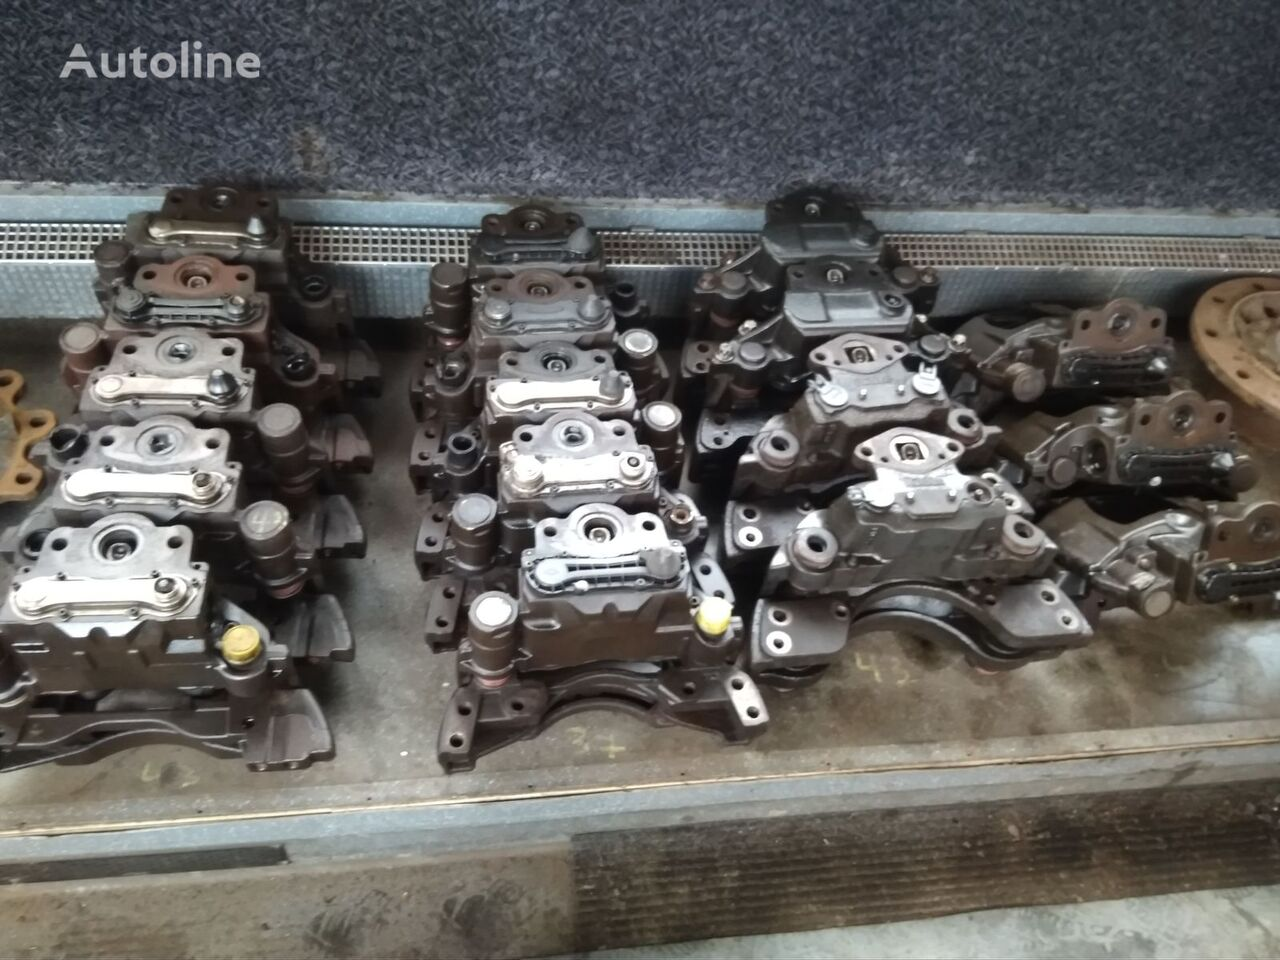 HALDEX KNORR BREMSE,MERITOR (19) brake caliper for trailer